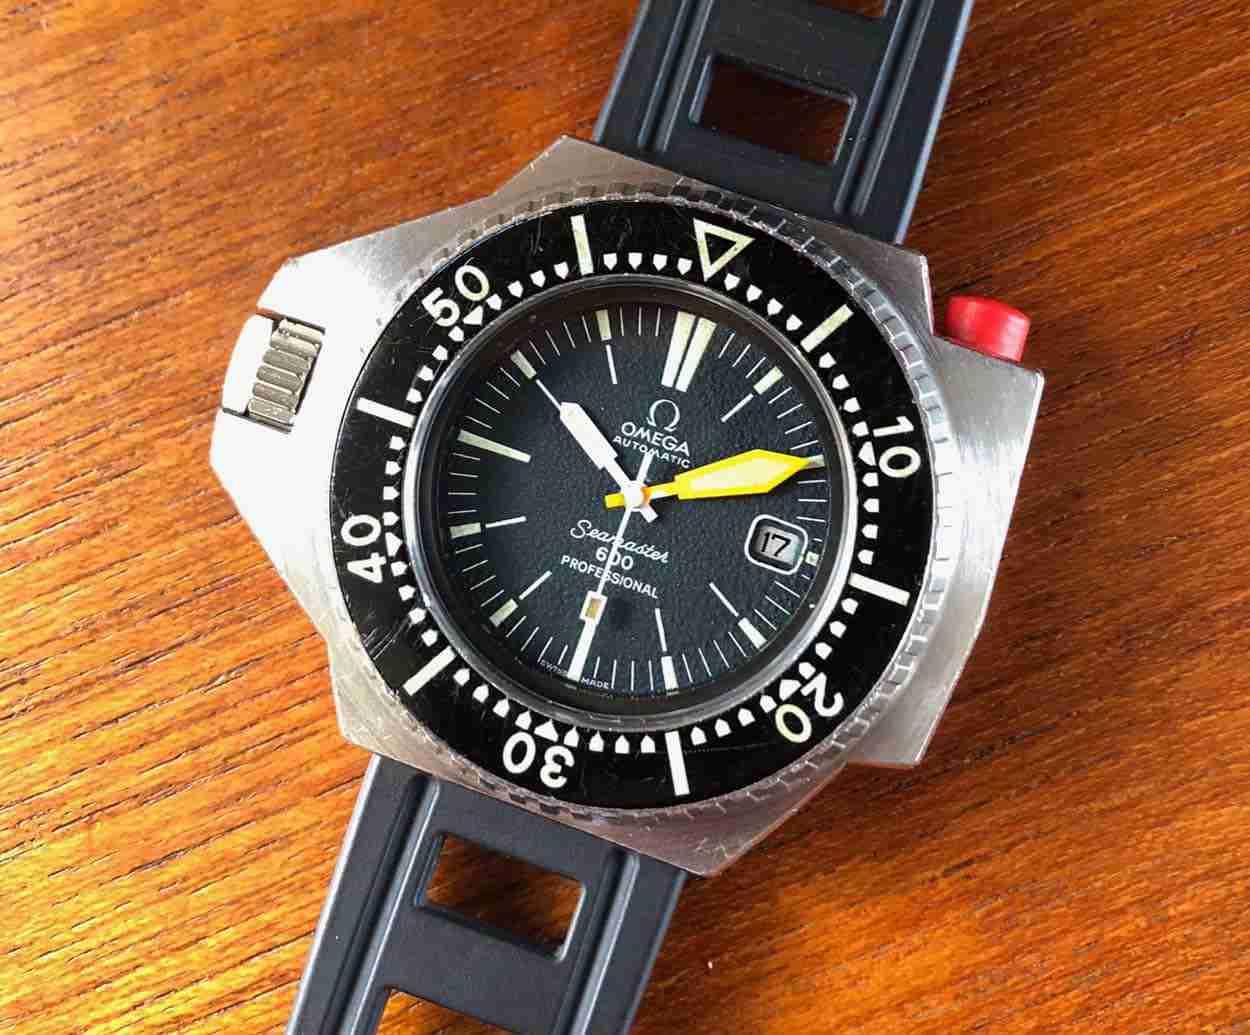 f99668355eb8 Legendaria Réplicas De Relojes Omega Seamaster PloProf Automático 600  Revisión